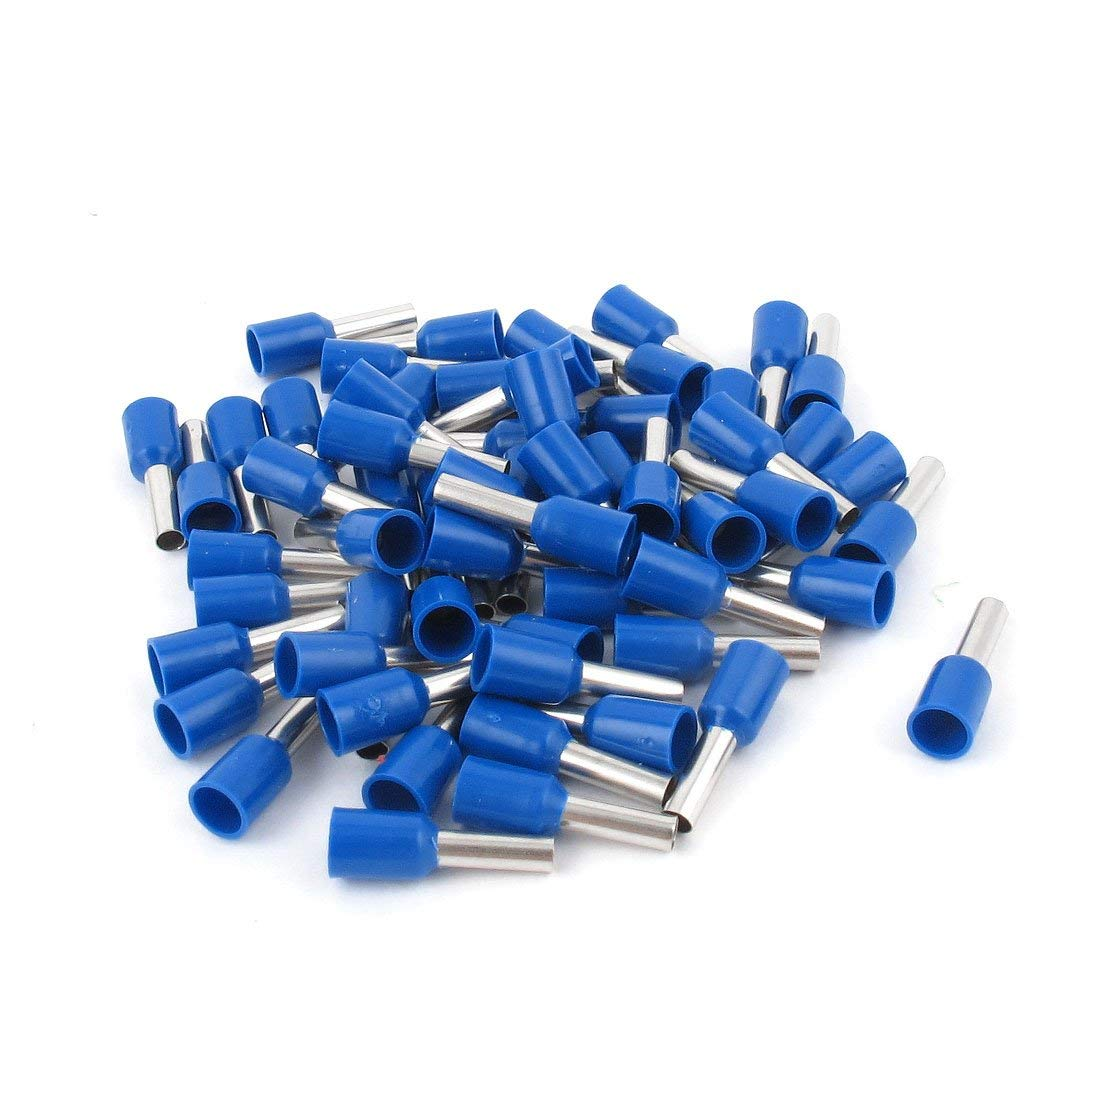 Cheap Insulated Wire Ferrule, find Insulated Wire Ferrule deals on ...